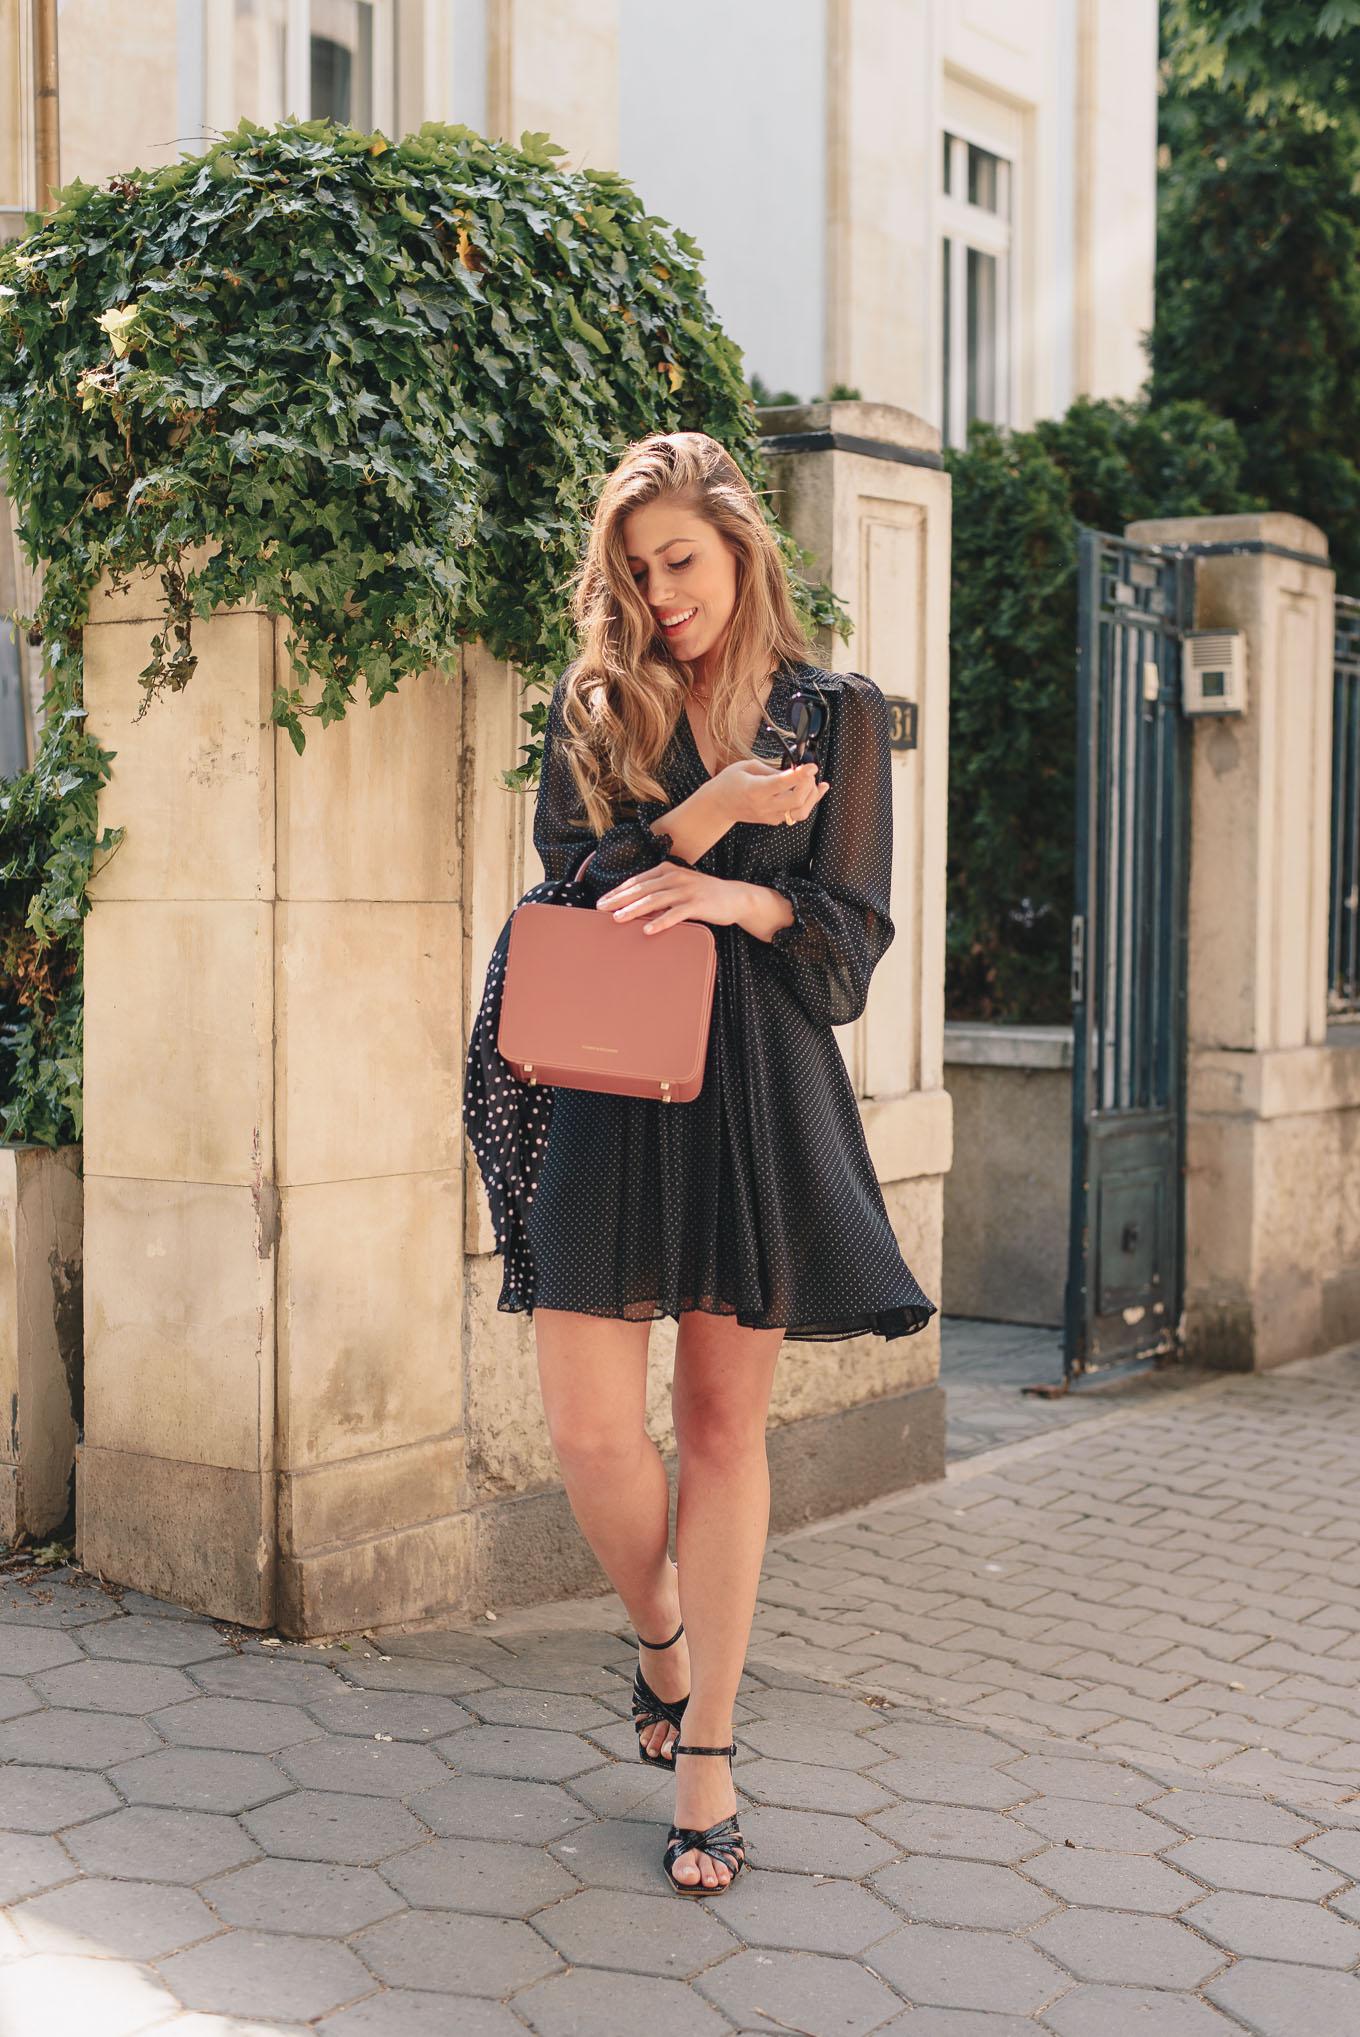 The Vanity Box Handbag